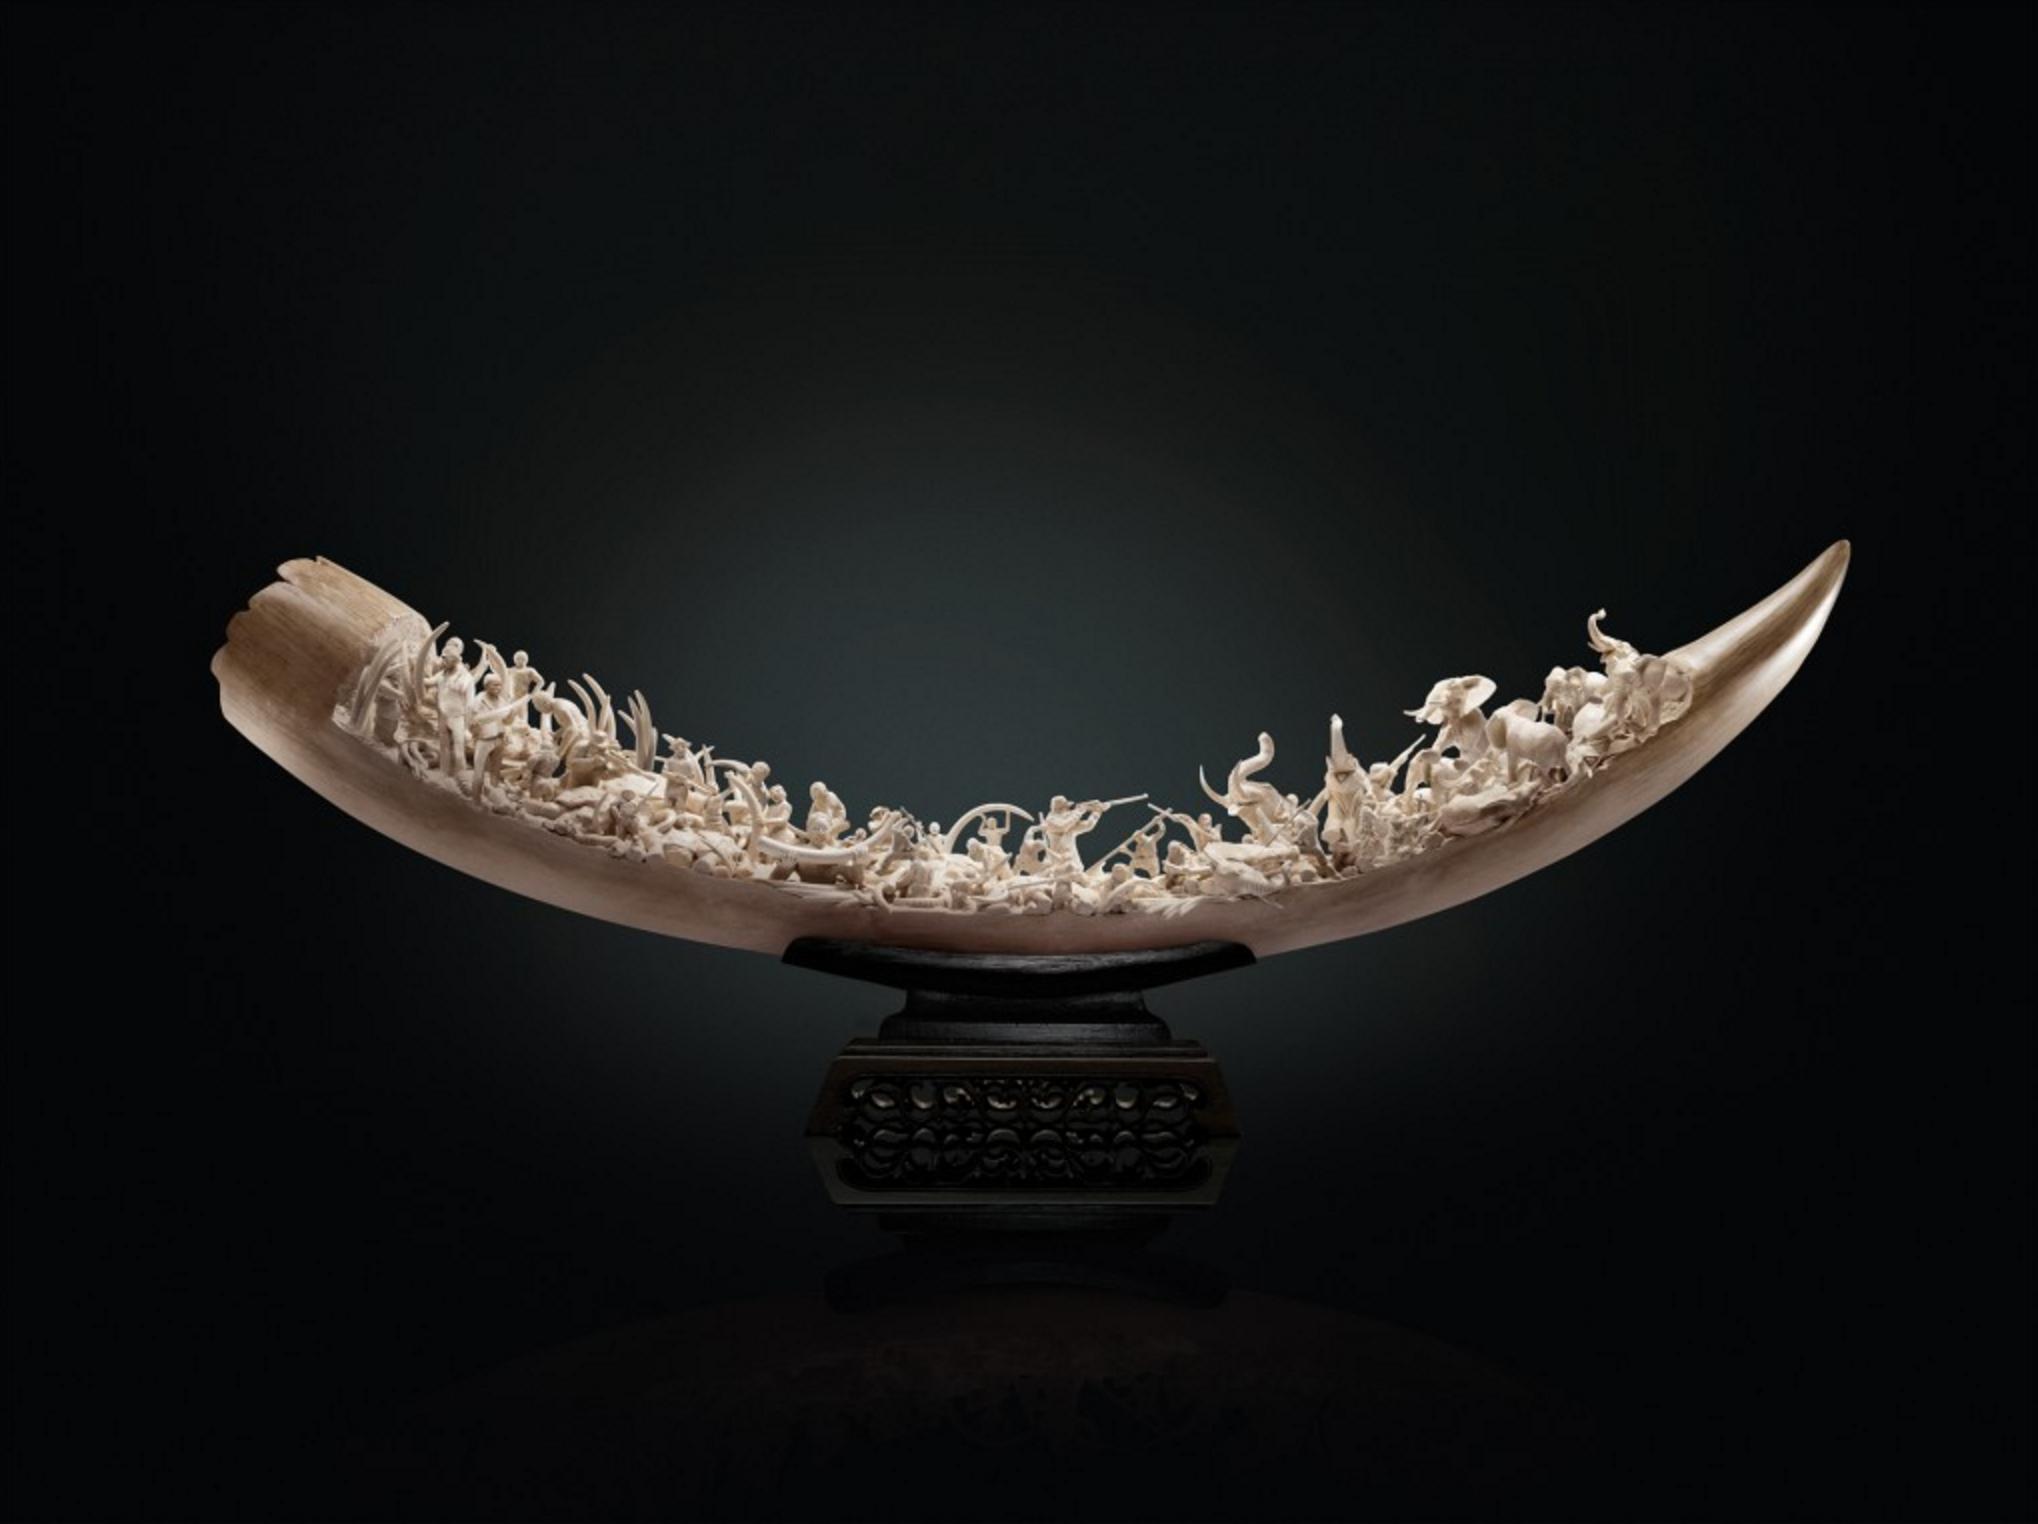 WWF (World Wildlife Fund) – Ivory